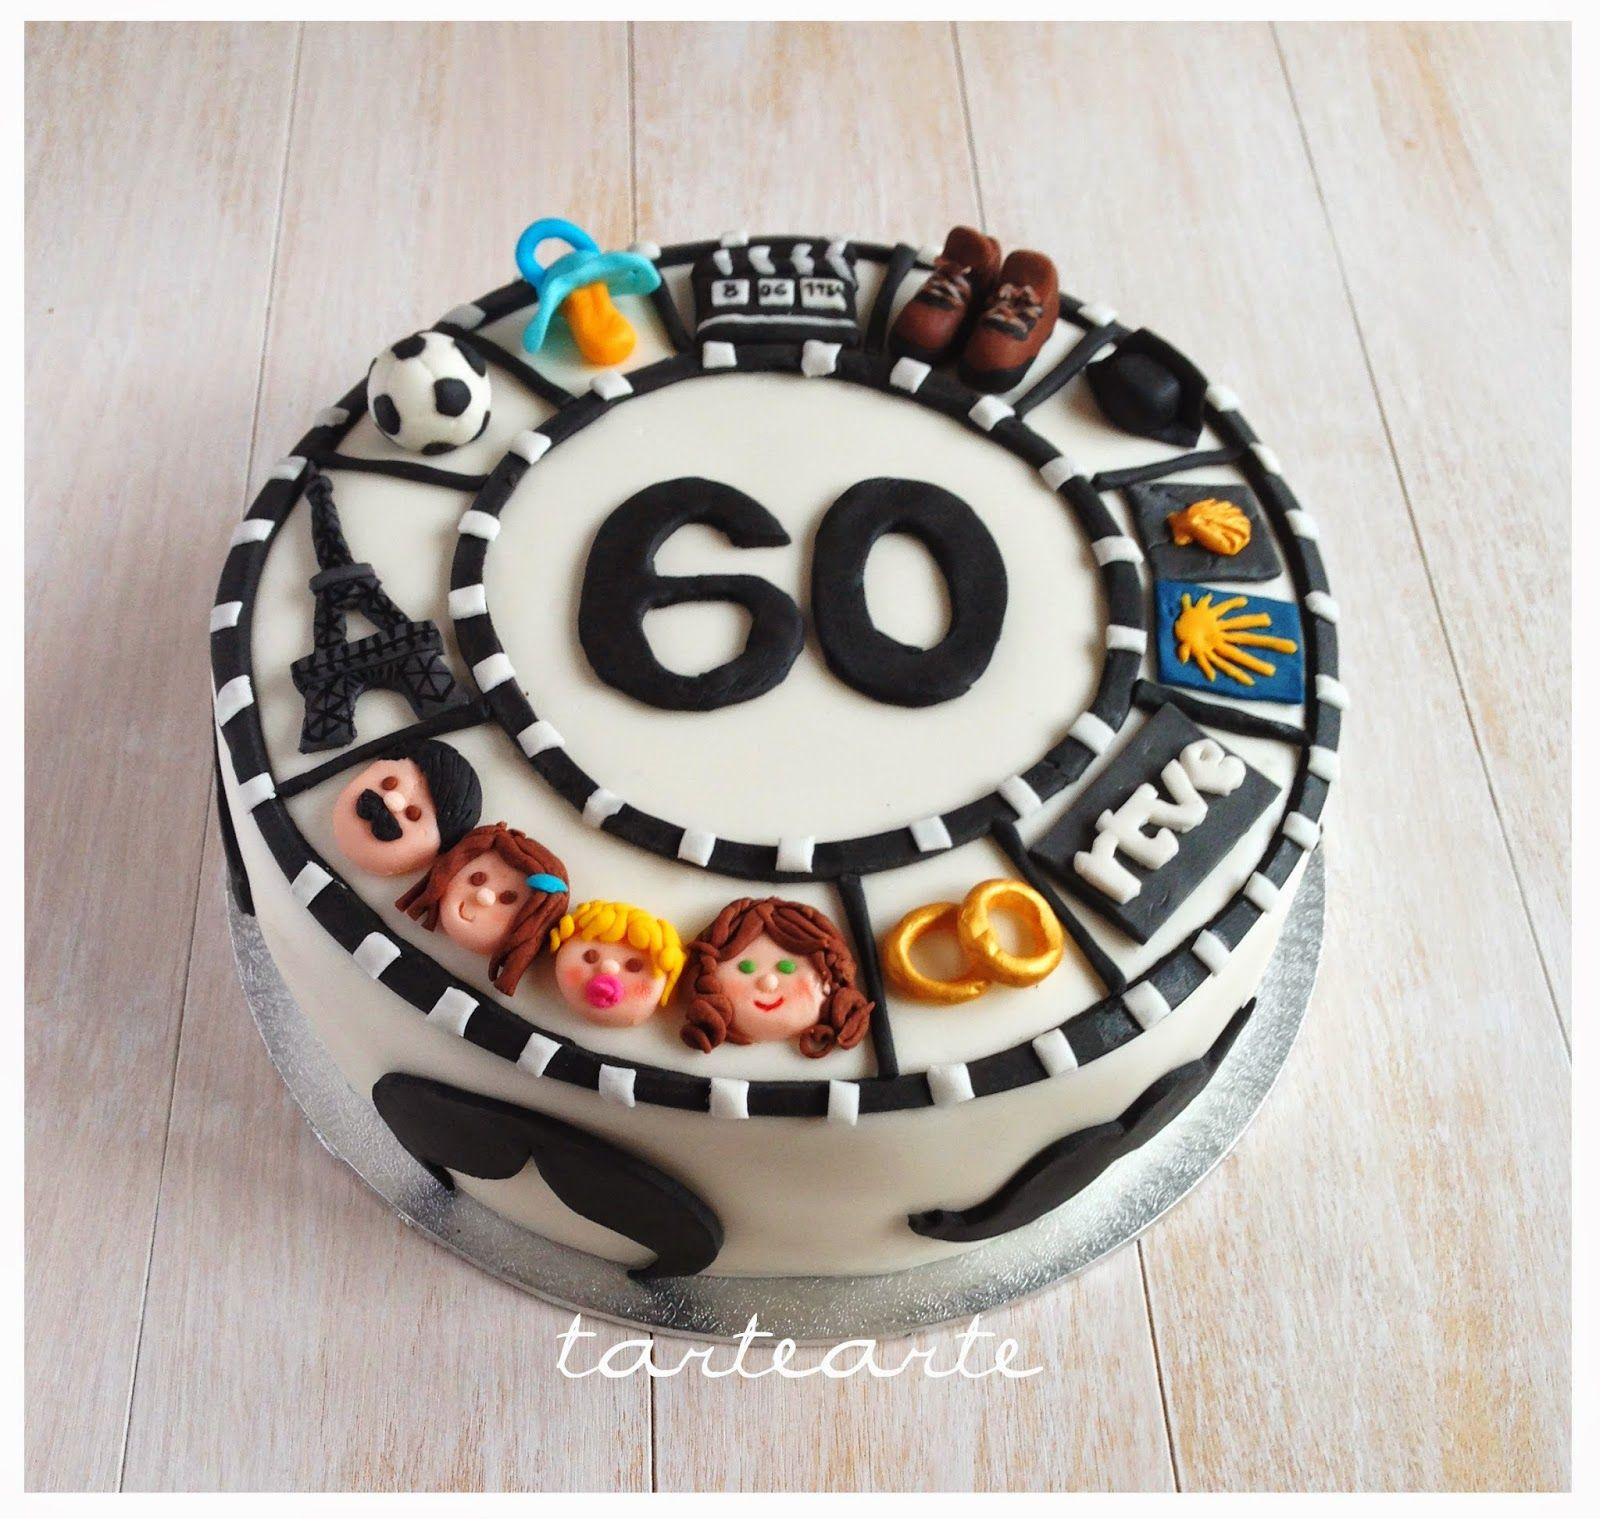 Tartas Fondant Tartas Torta Para Fiesta Tortas Para Hombres